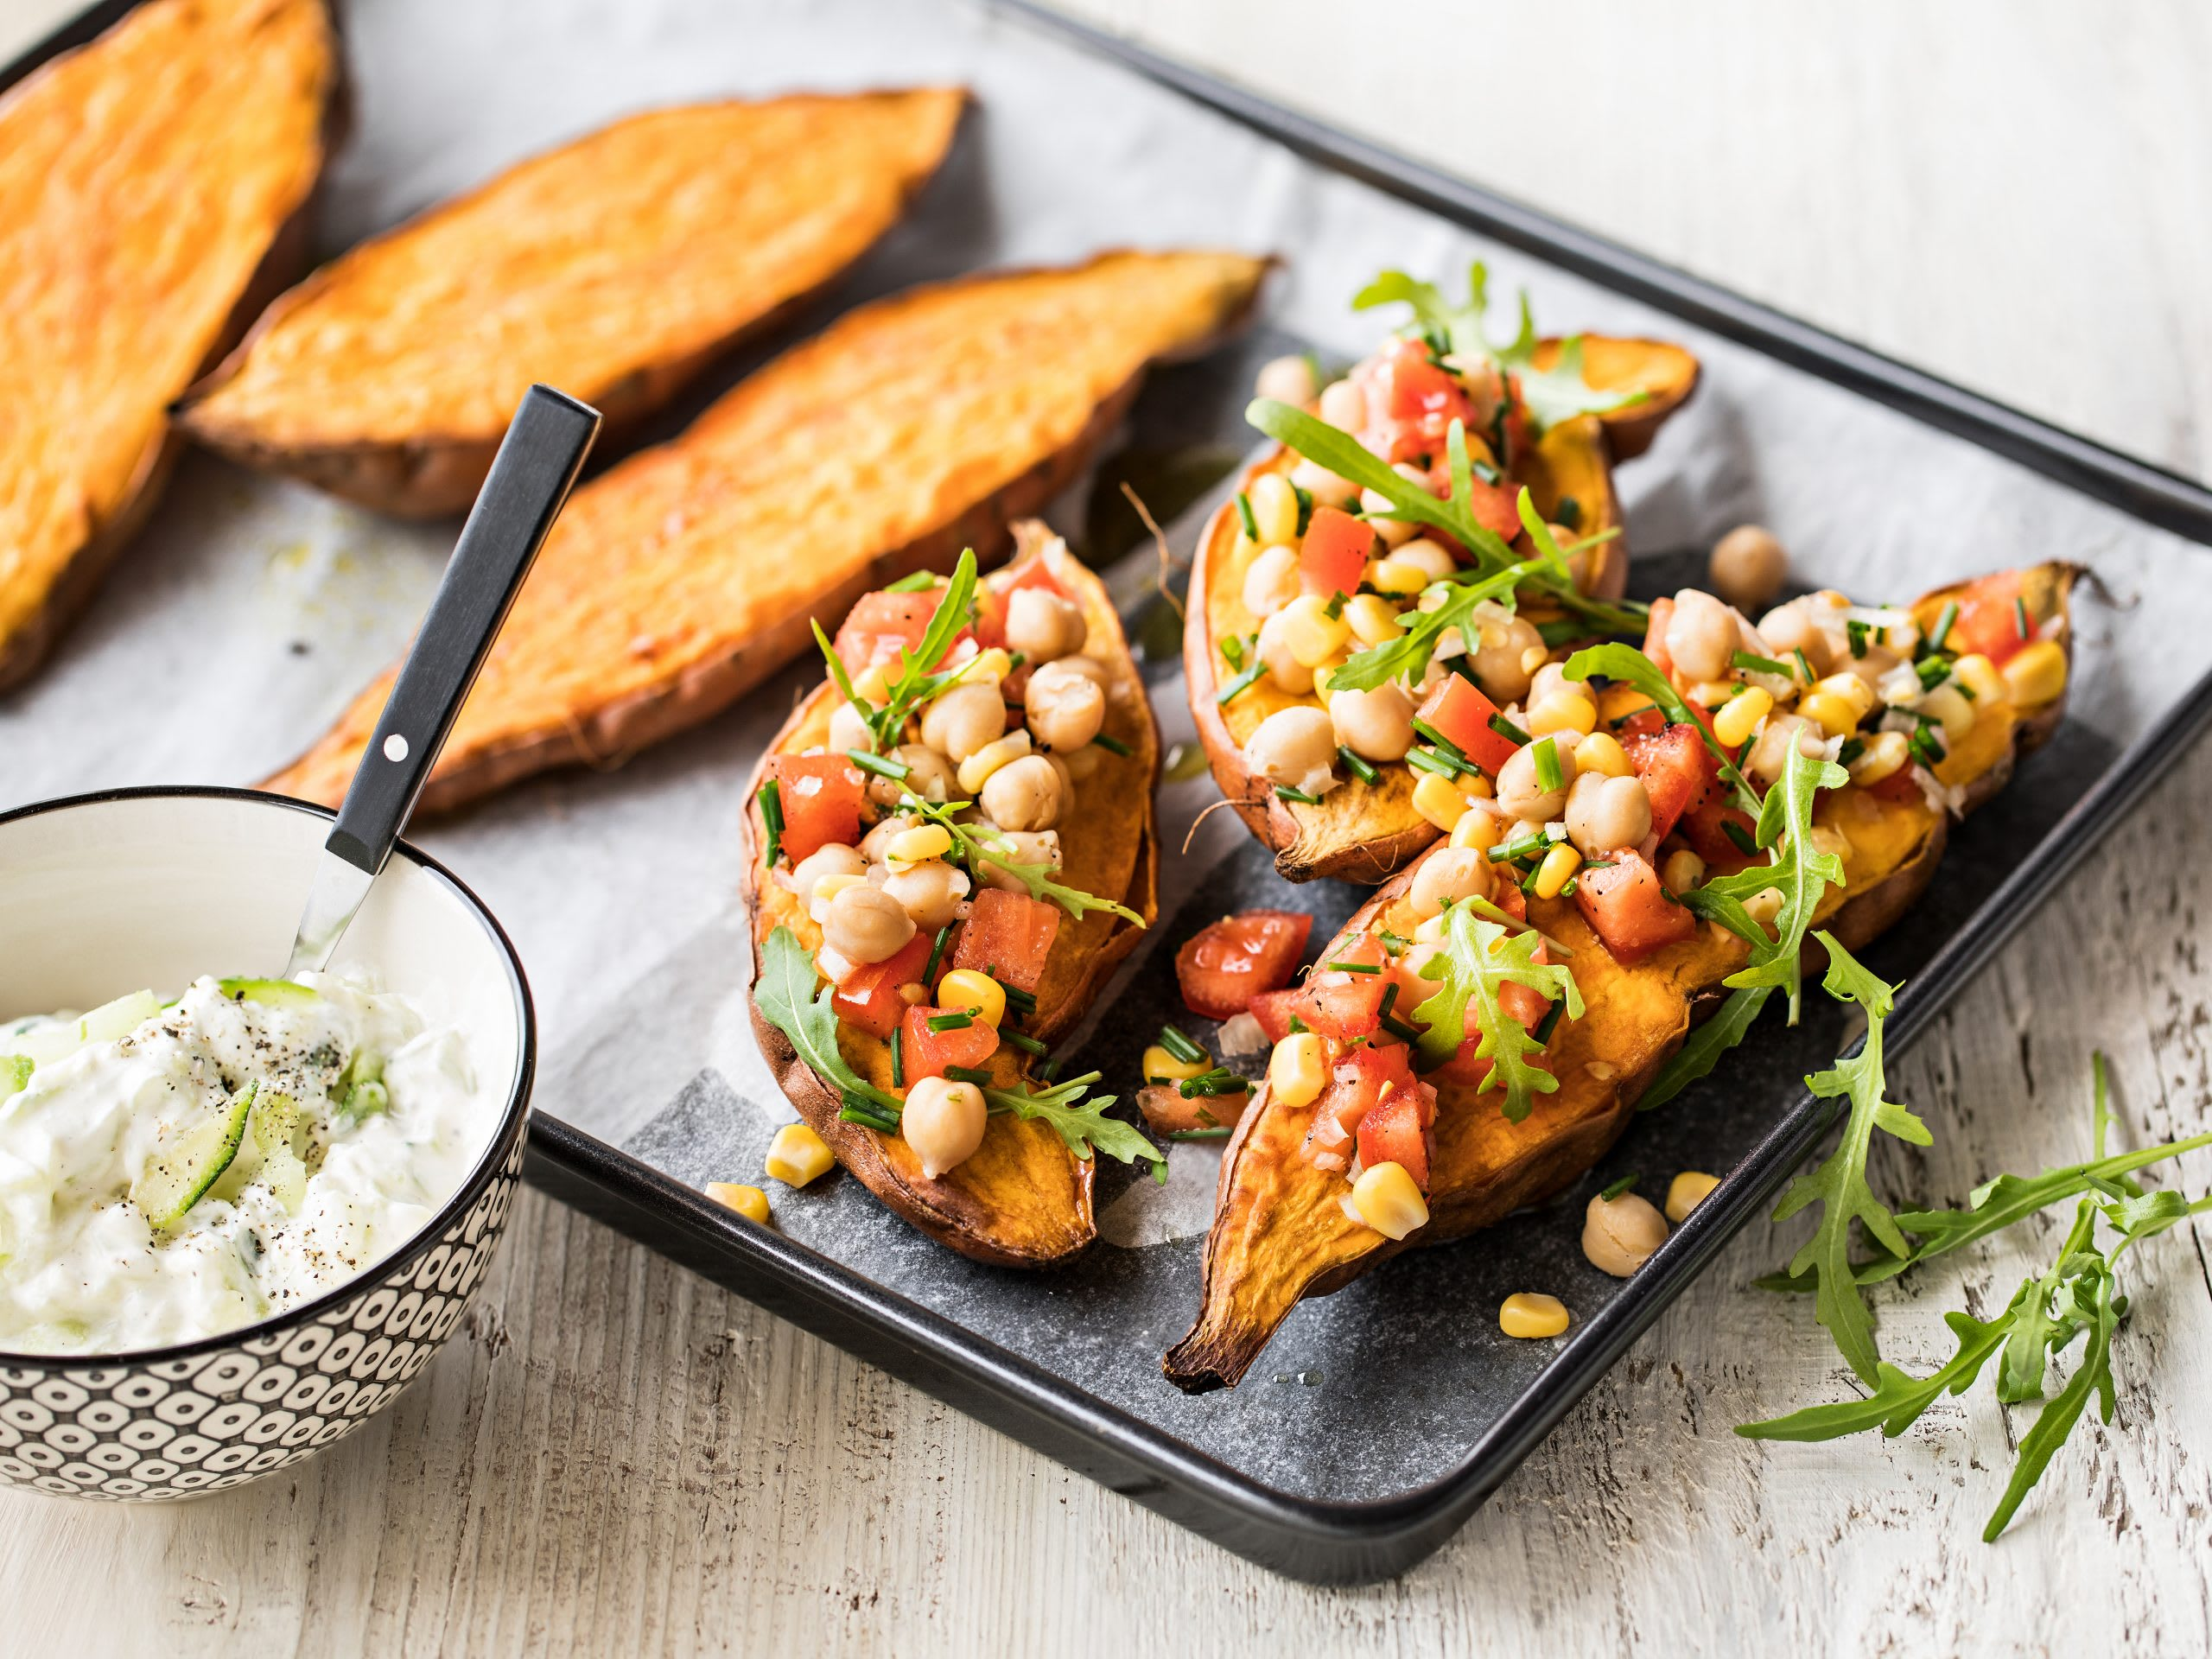 Baked potatoes aux pois chiches et tzatziki